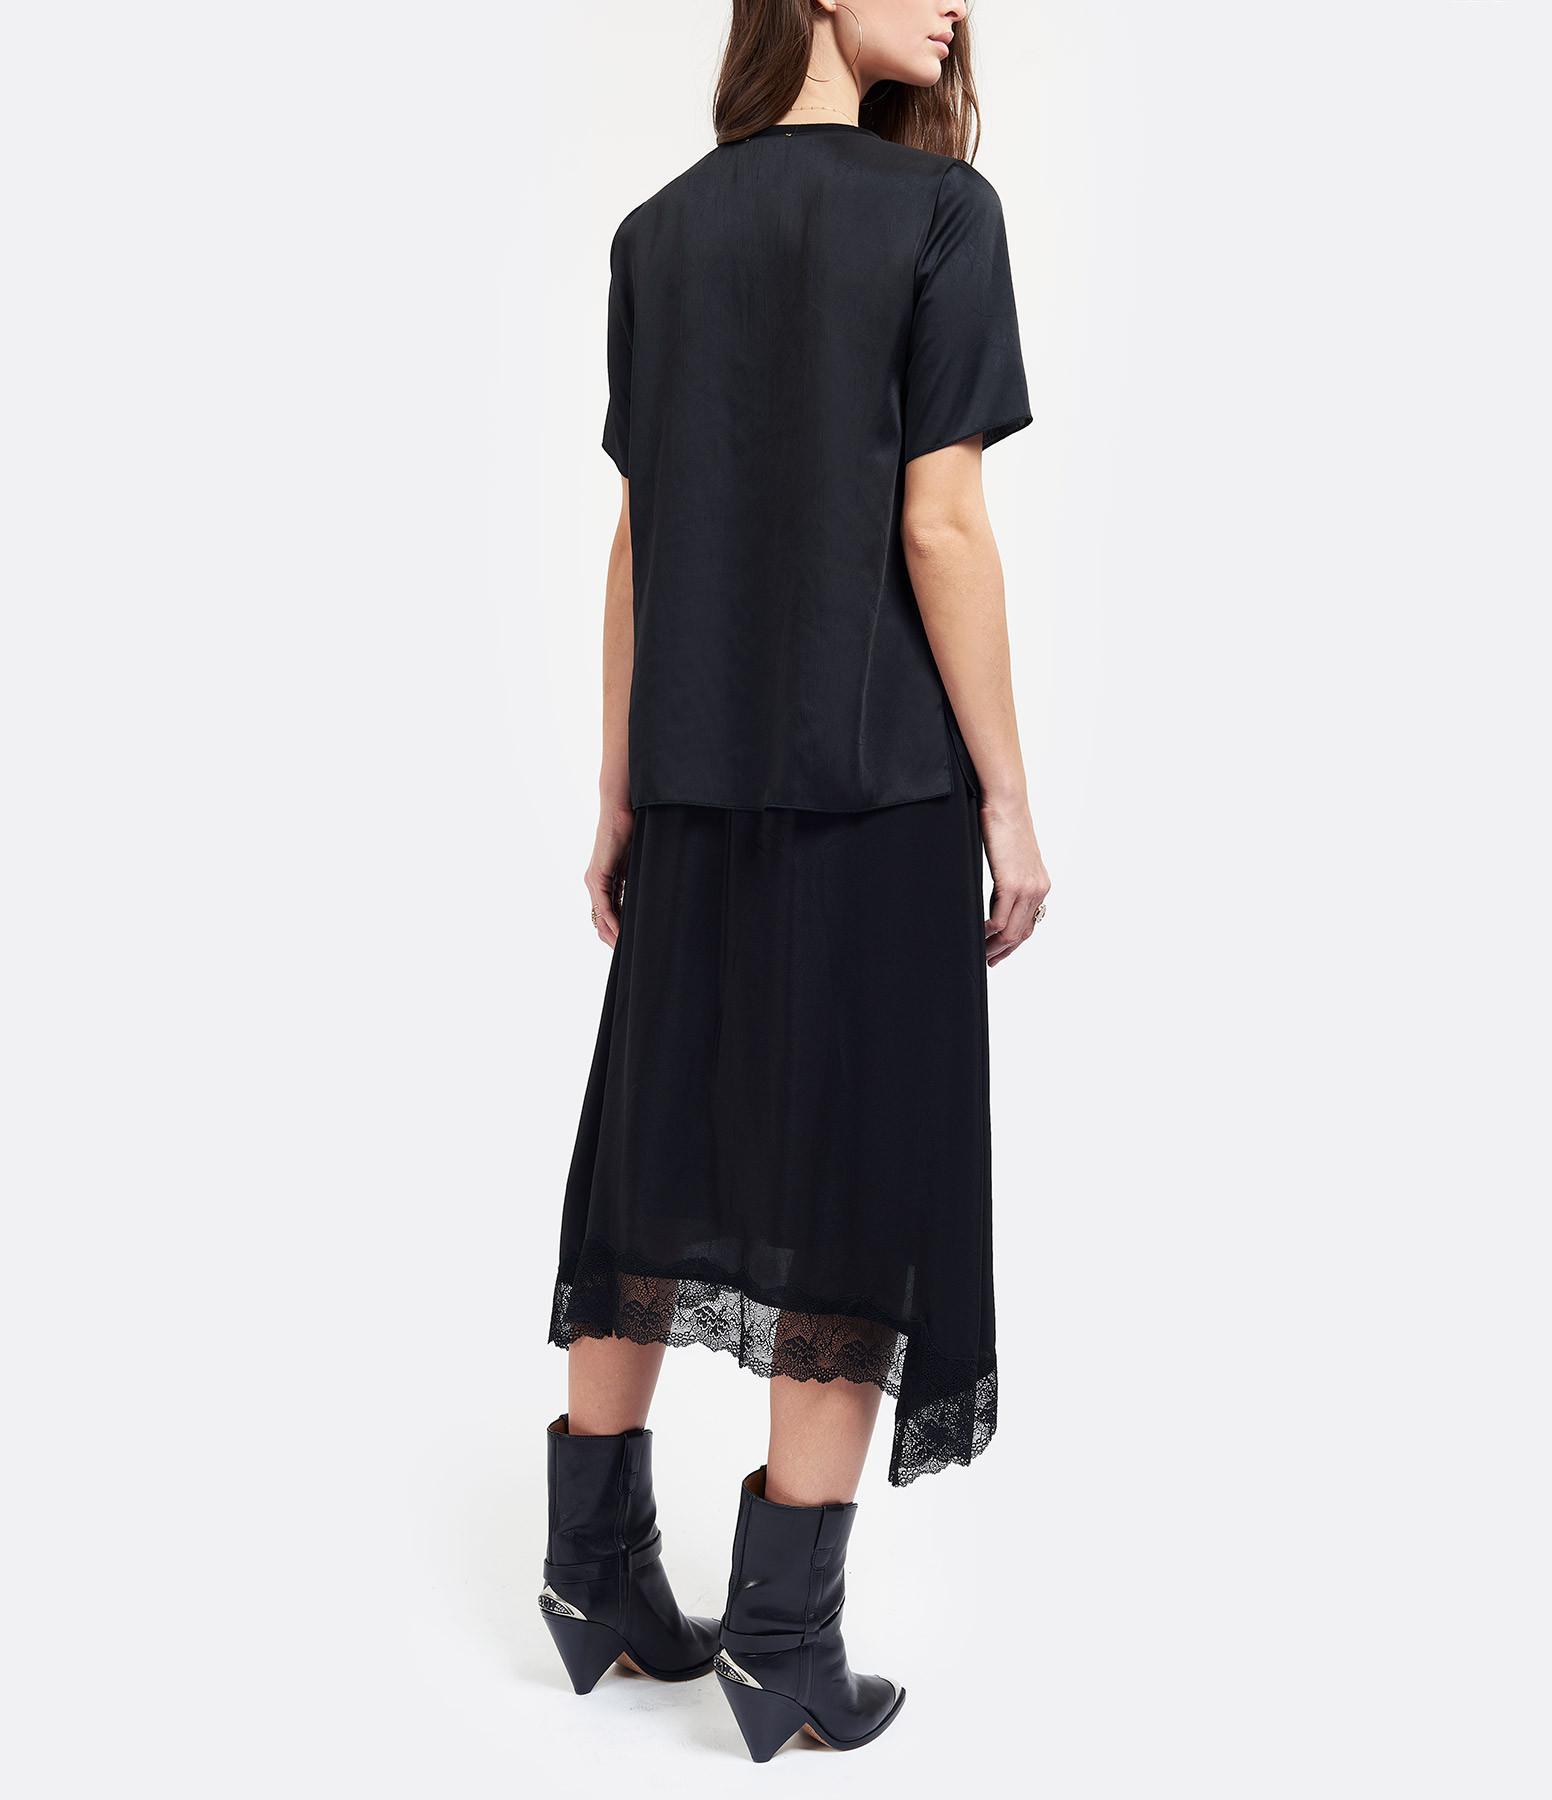 FORTE_FORTE - Tee-shirt Satin Noir